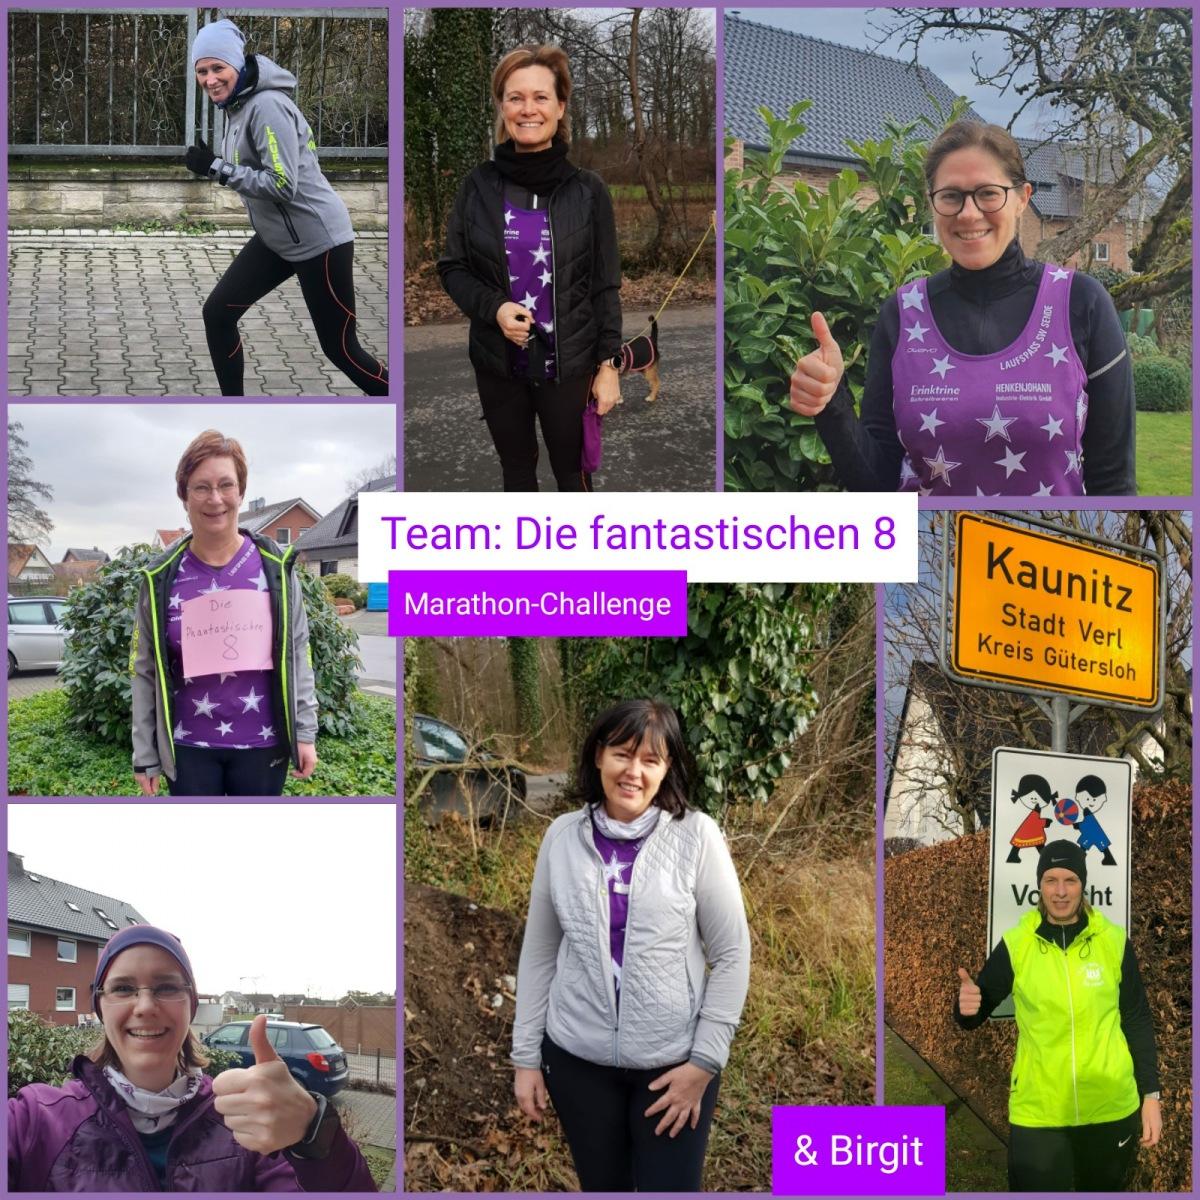 Backes-Heike-4-Challenge-Marathon-Team-bQzsE